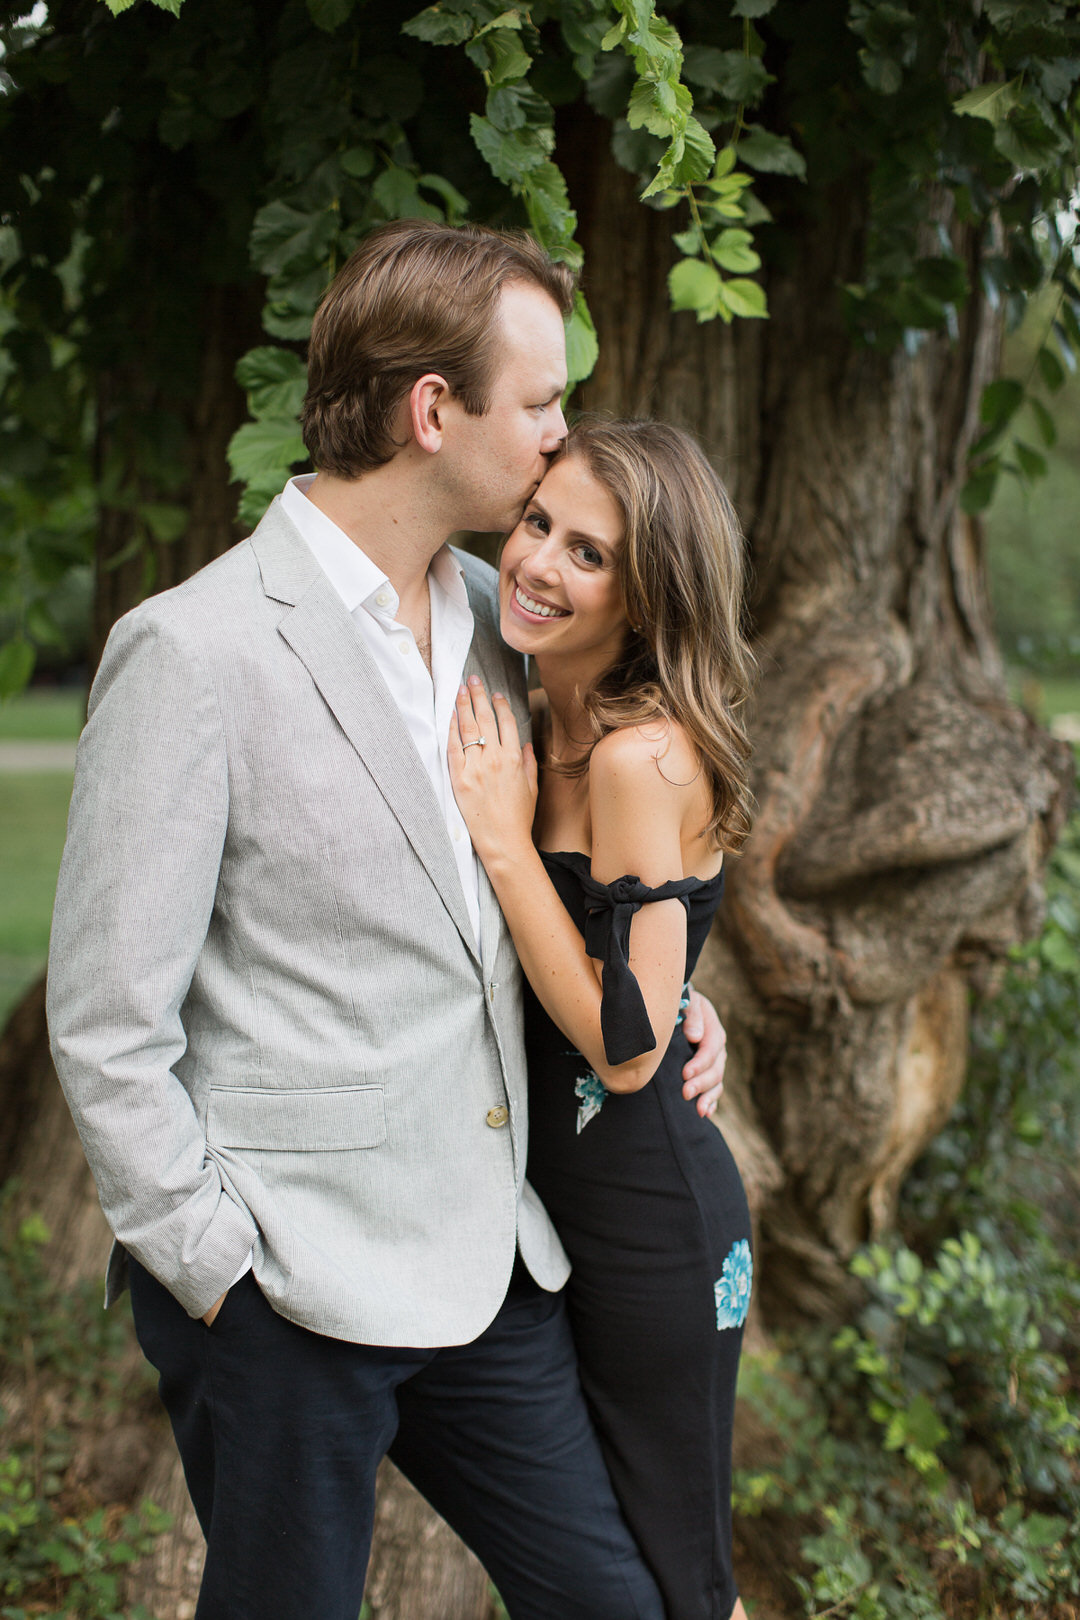 Melissa Kruse Photography - Meghan & Pete Engagement Photos-156.jpg